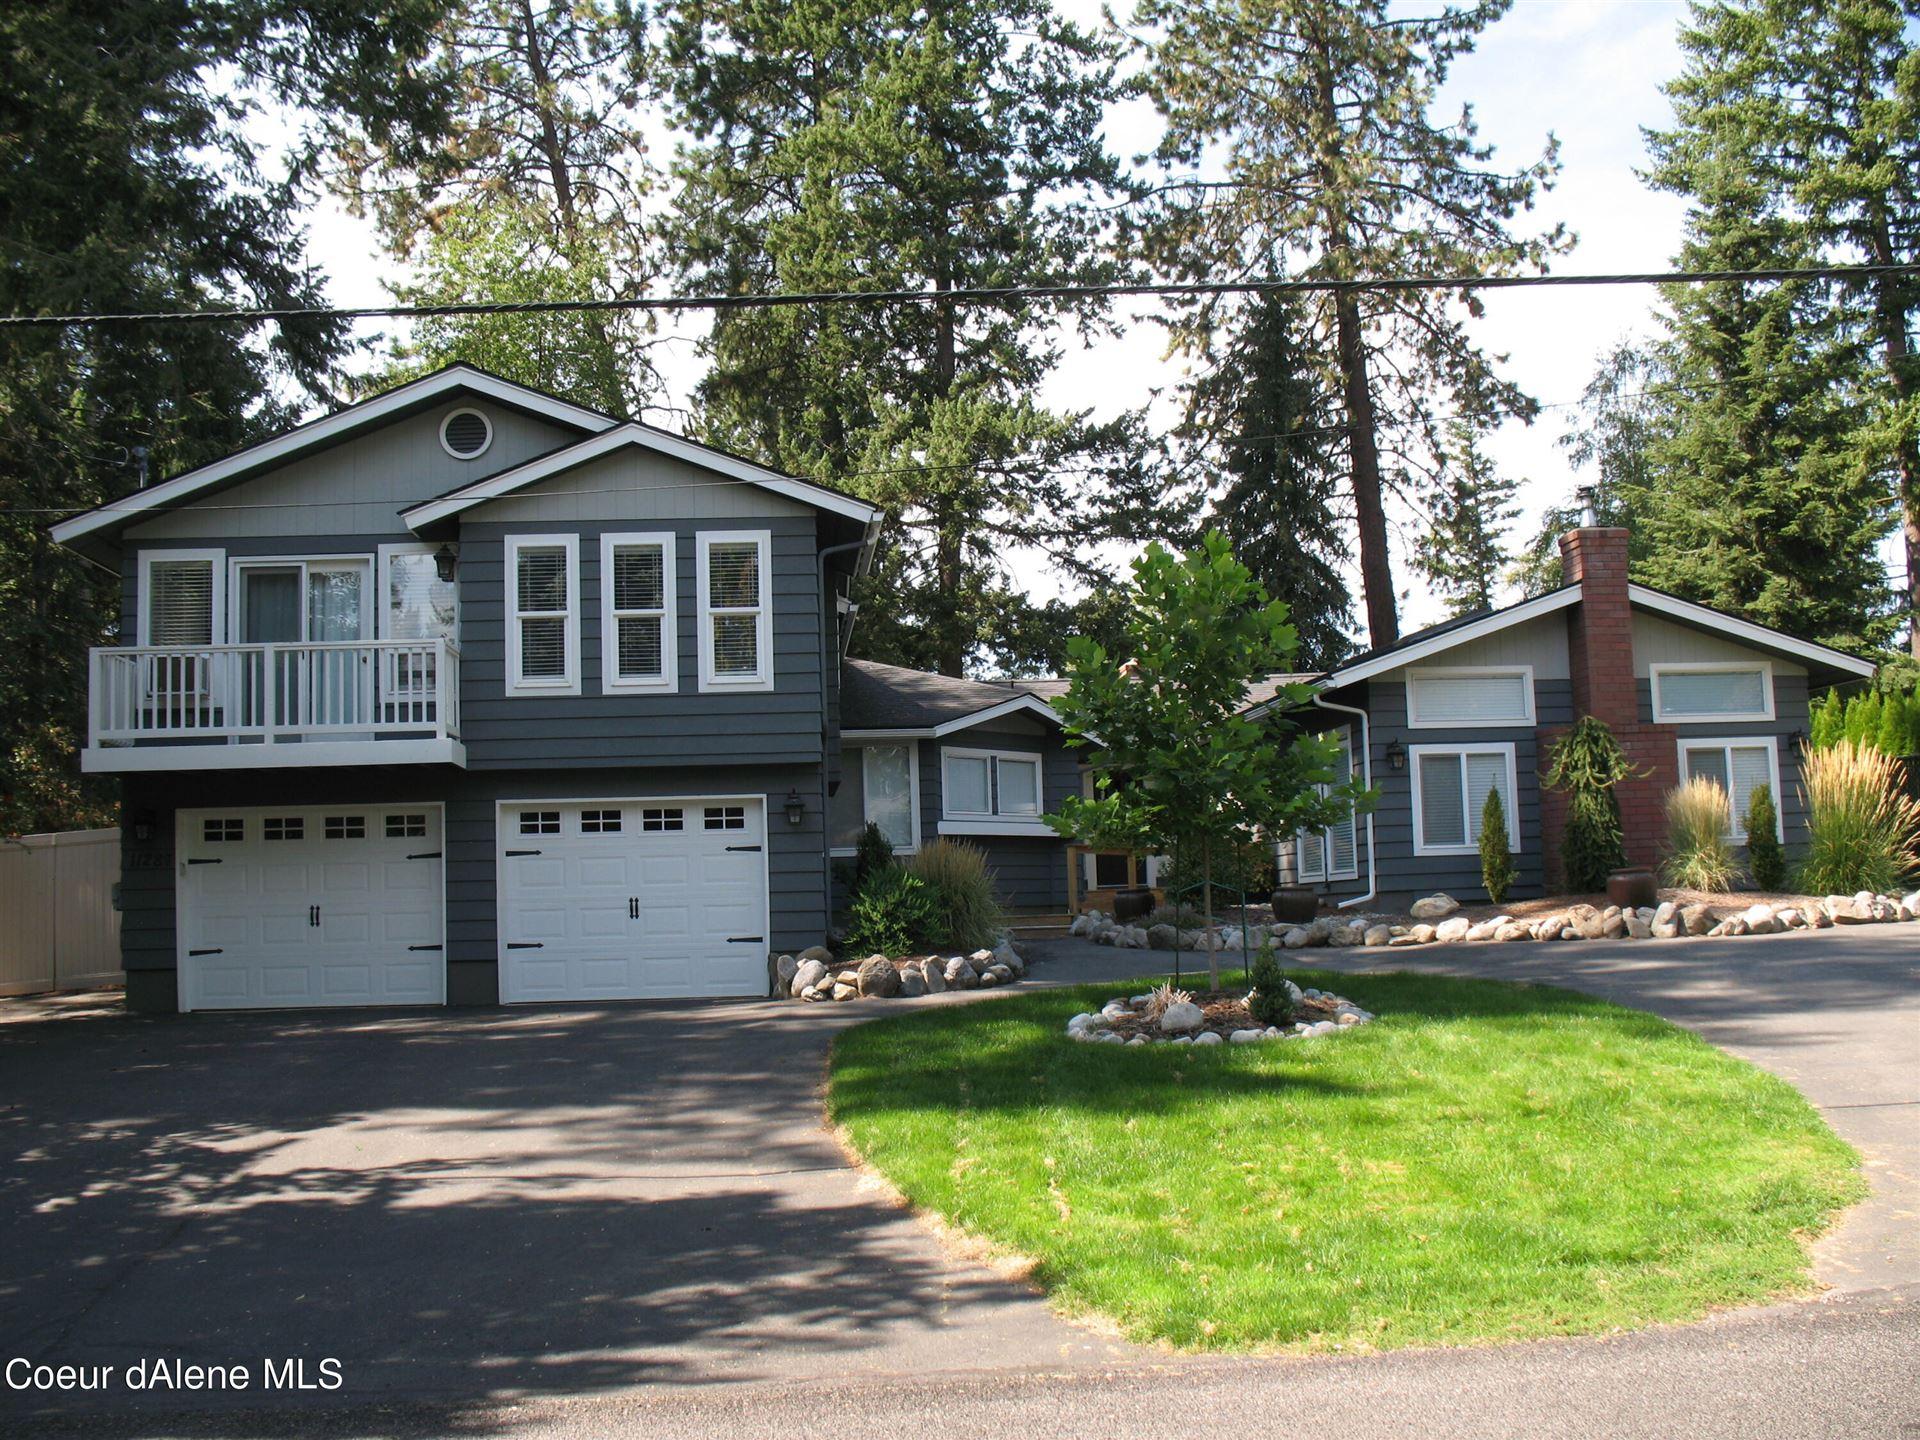 Photo of 11287 N TRAFALGAR ST, Hayden, ID 83835 (MLS # 21-9479)